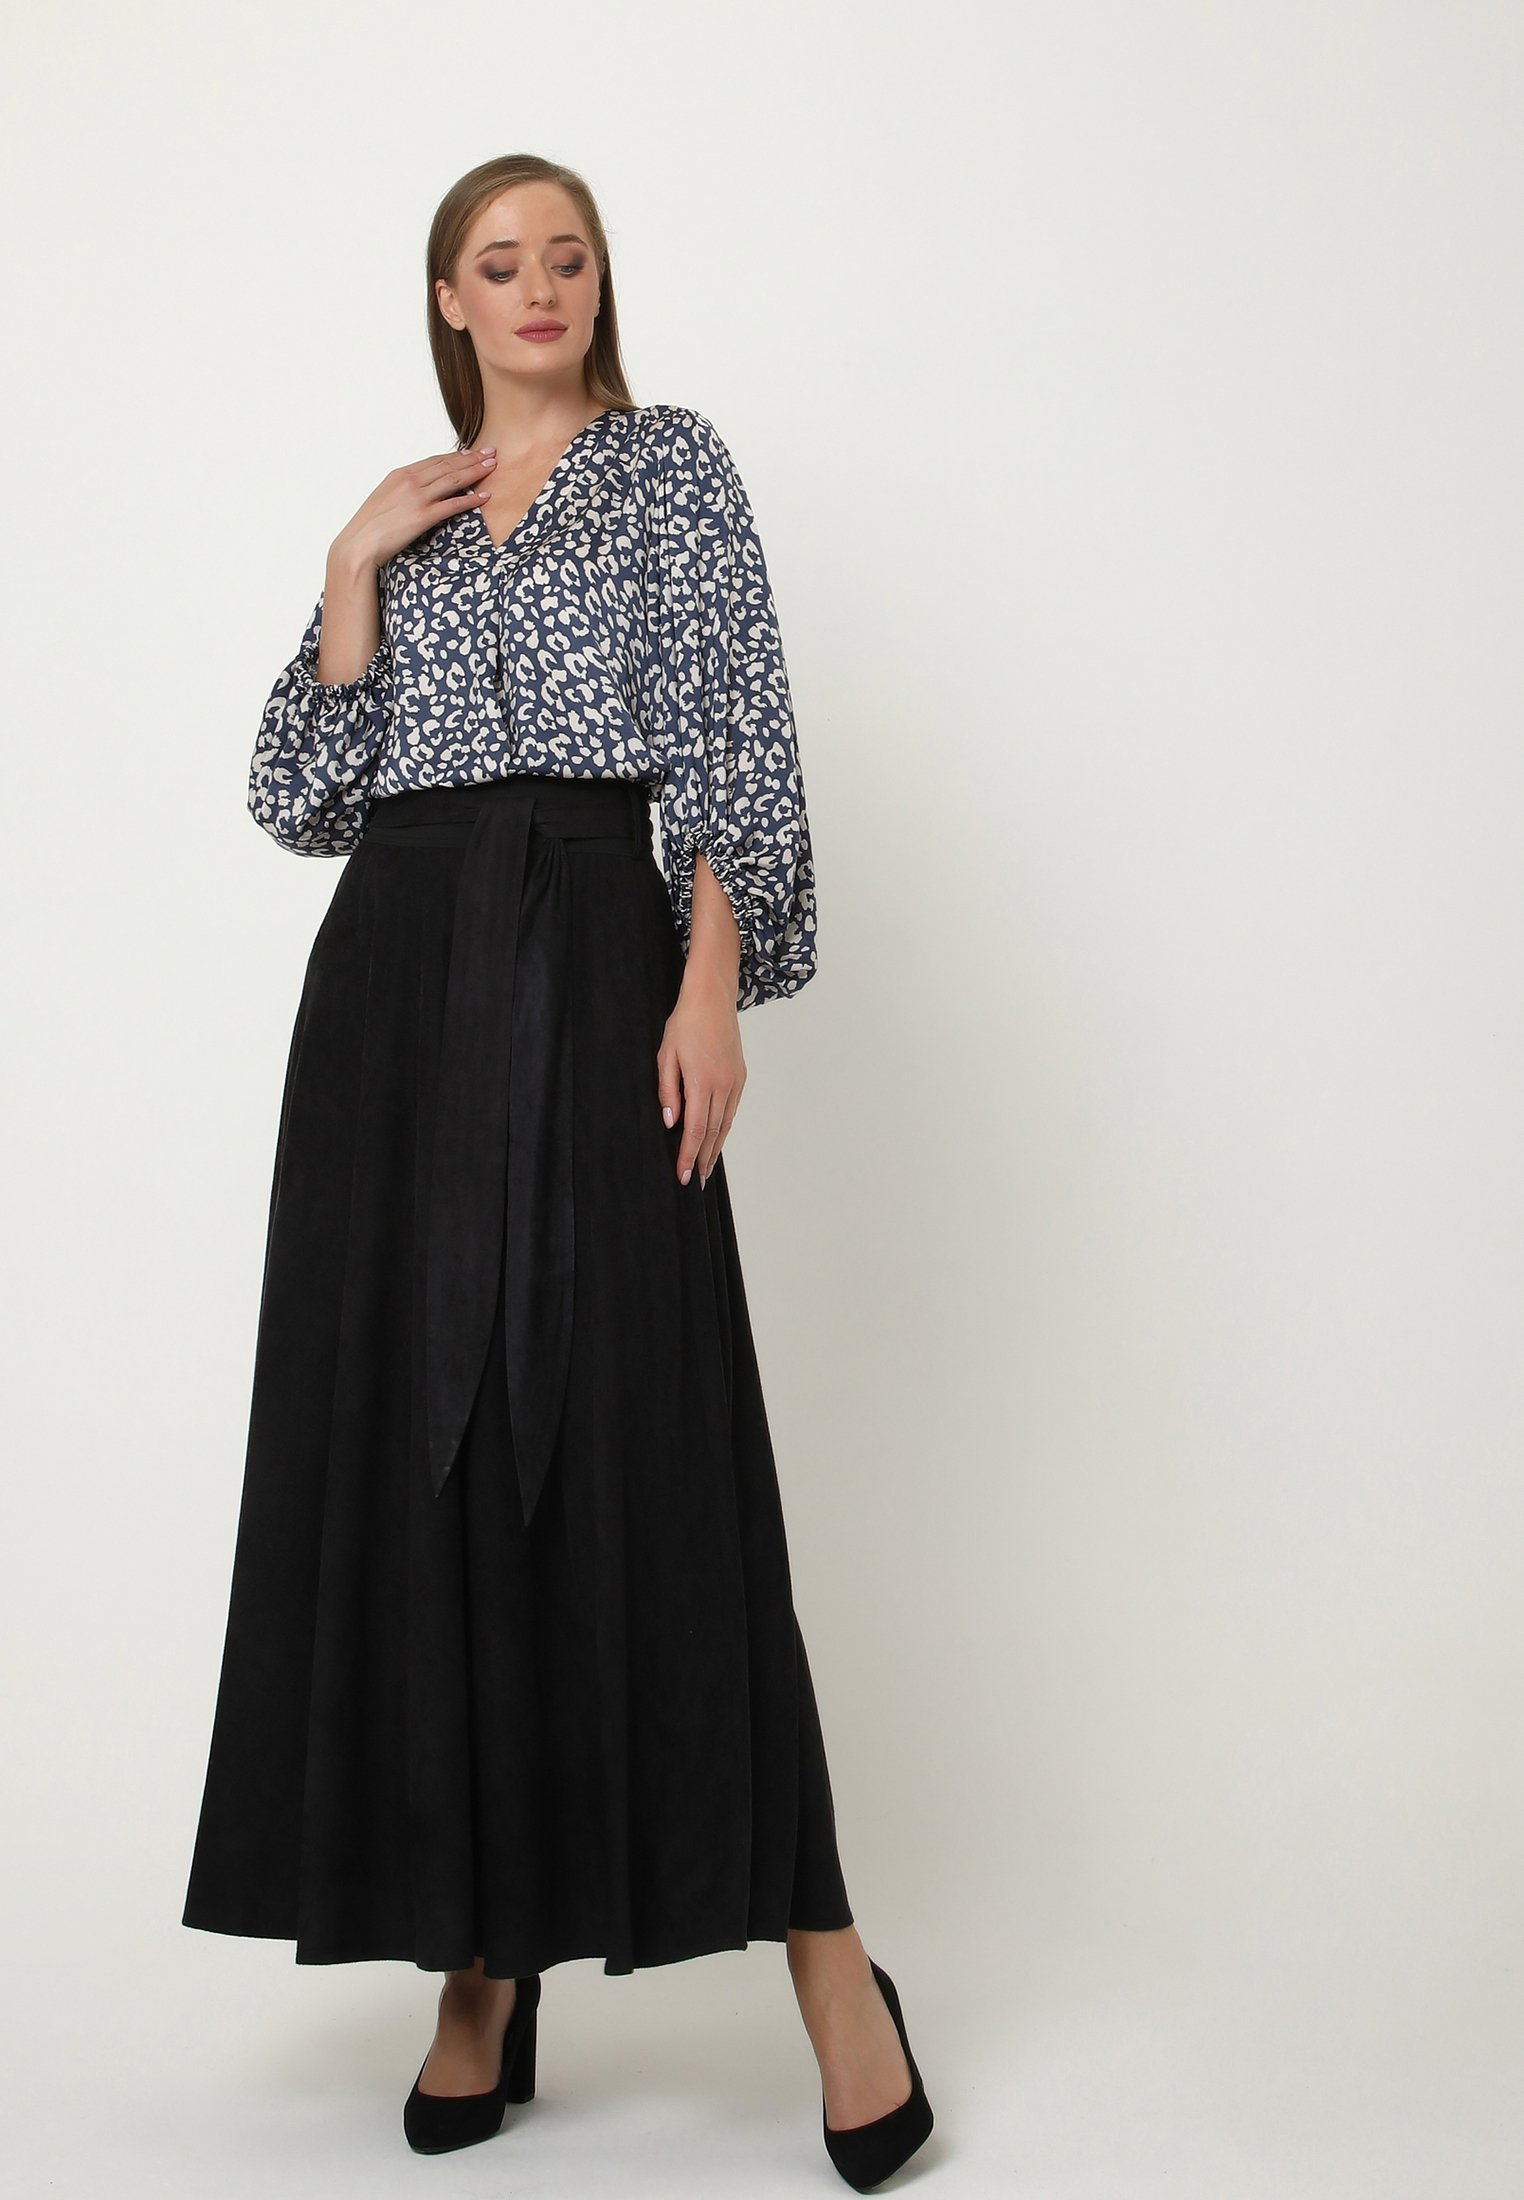 Femme RITA - Jupe plissée